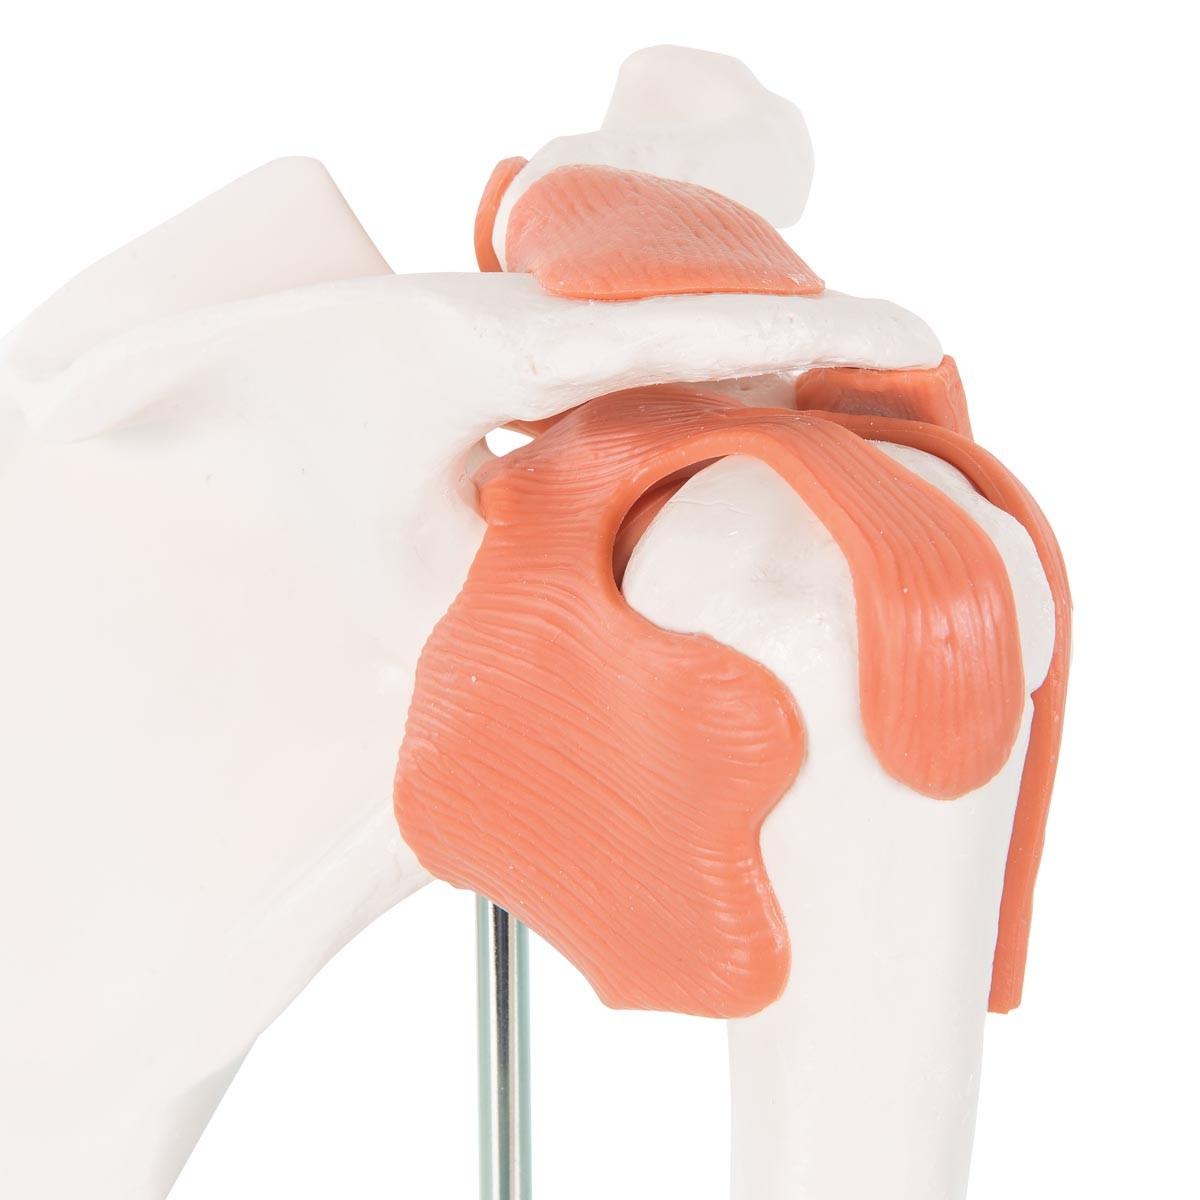 Schultergelenk-Funktionsmodell